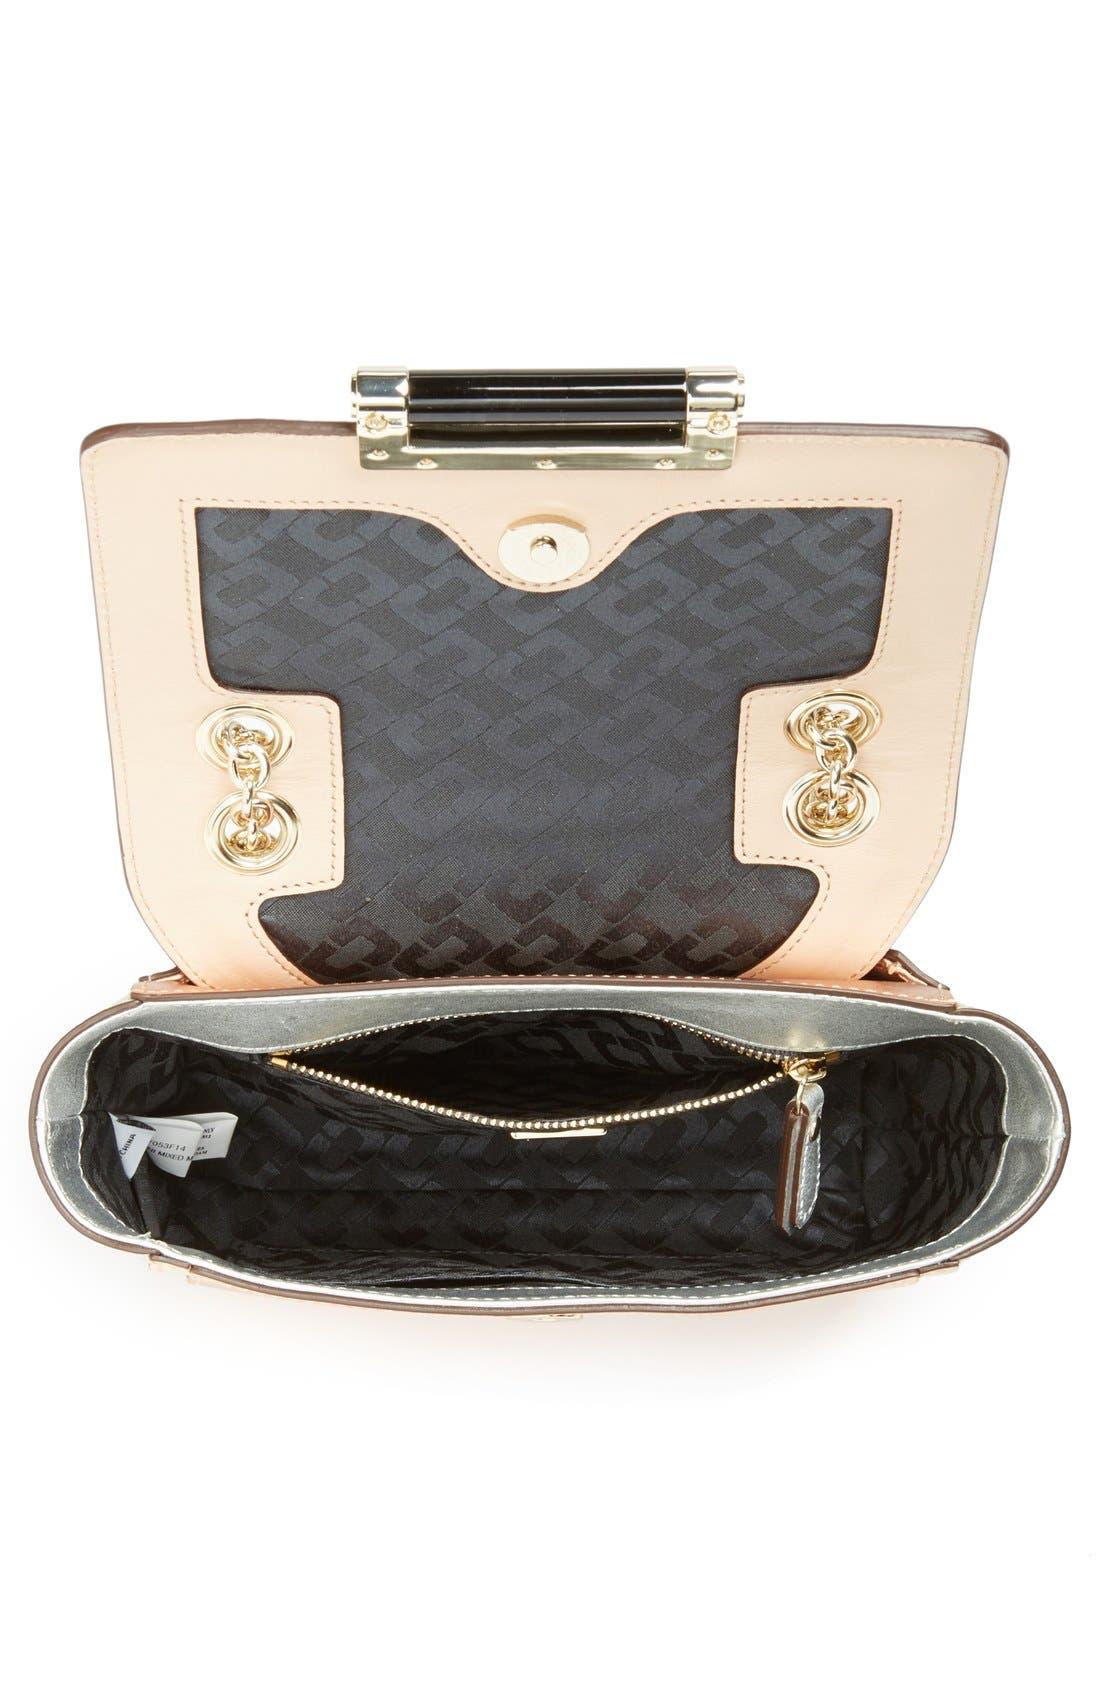 DIANE VON FURSTENBERG,                             '440 - Mini' Metallic Leather Crossbody Bag,                             Alternate thumbnail 3, color,                             710